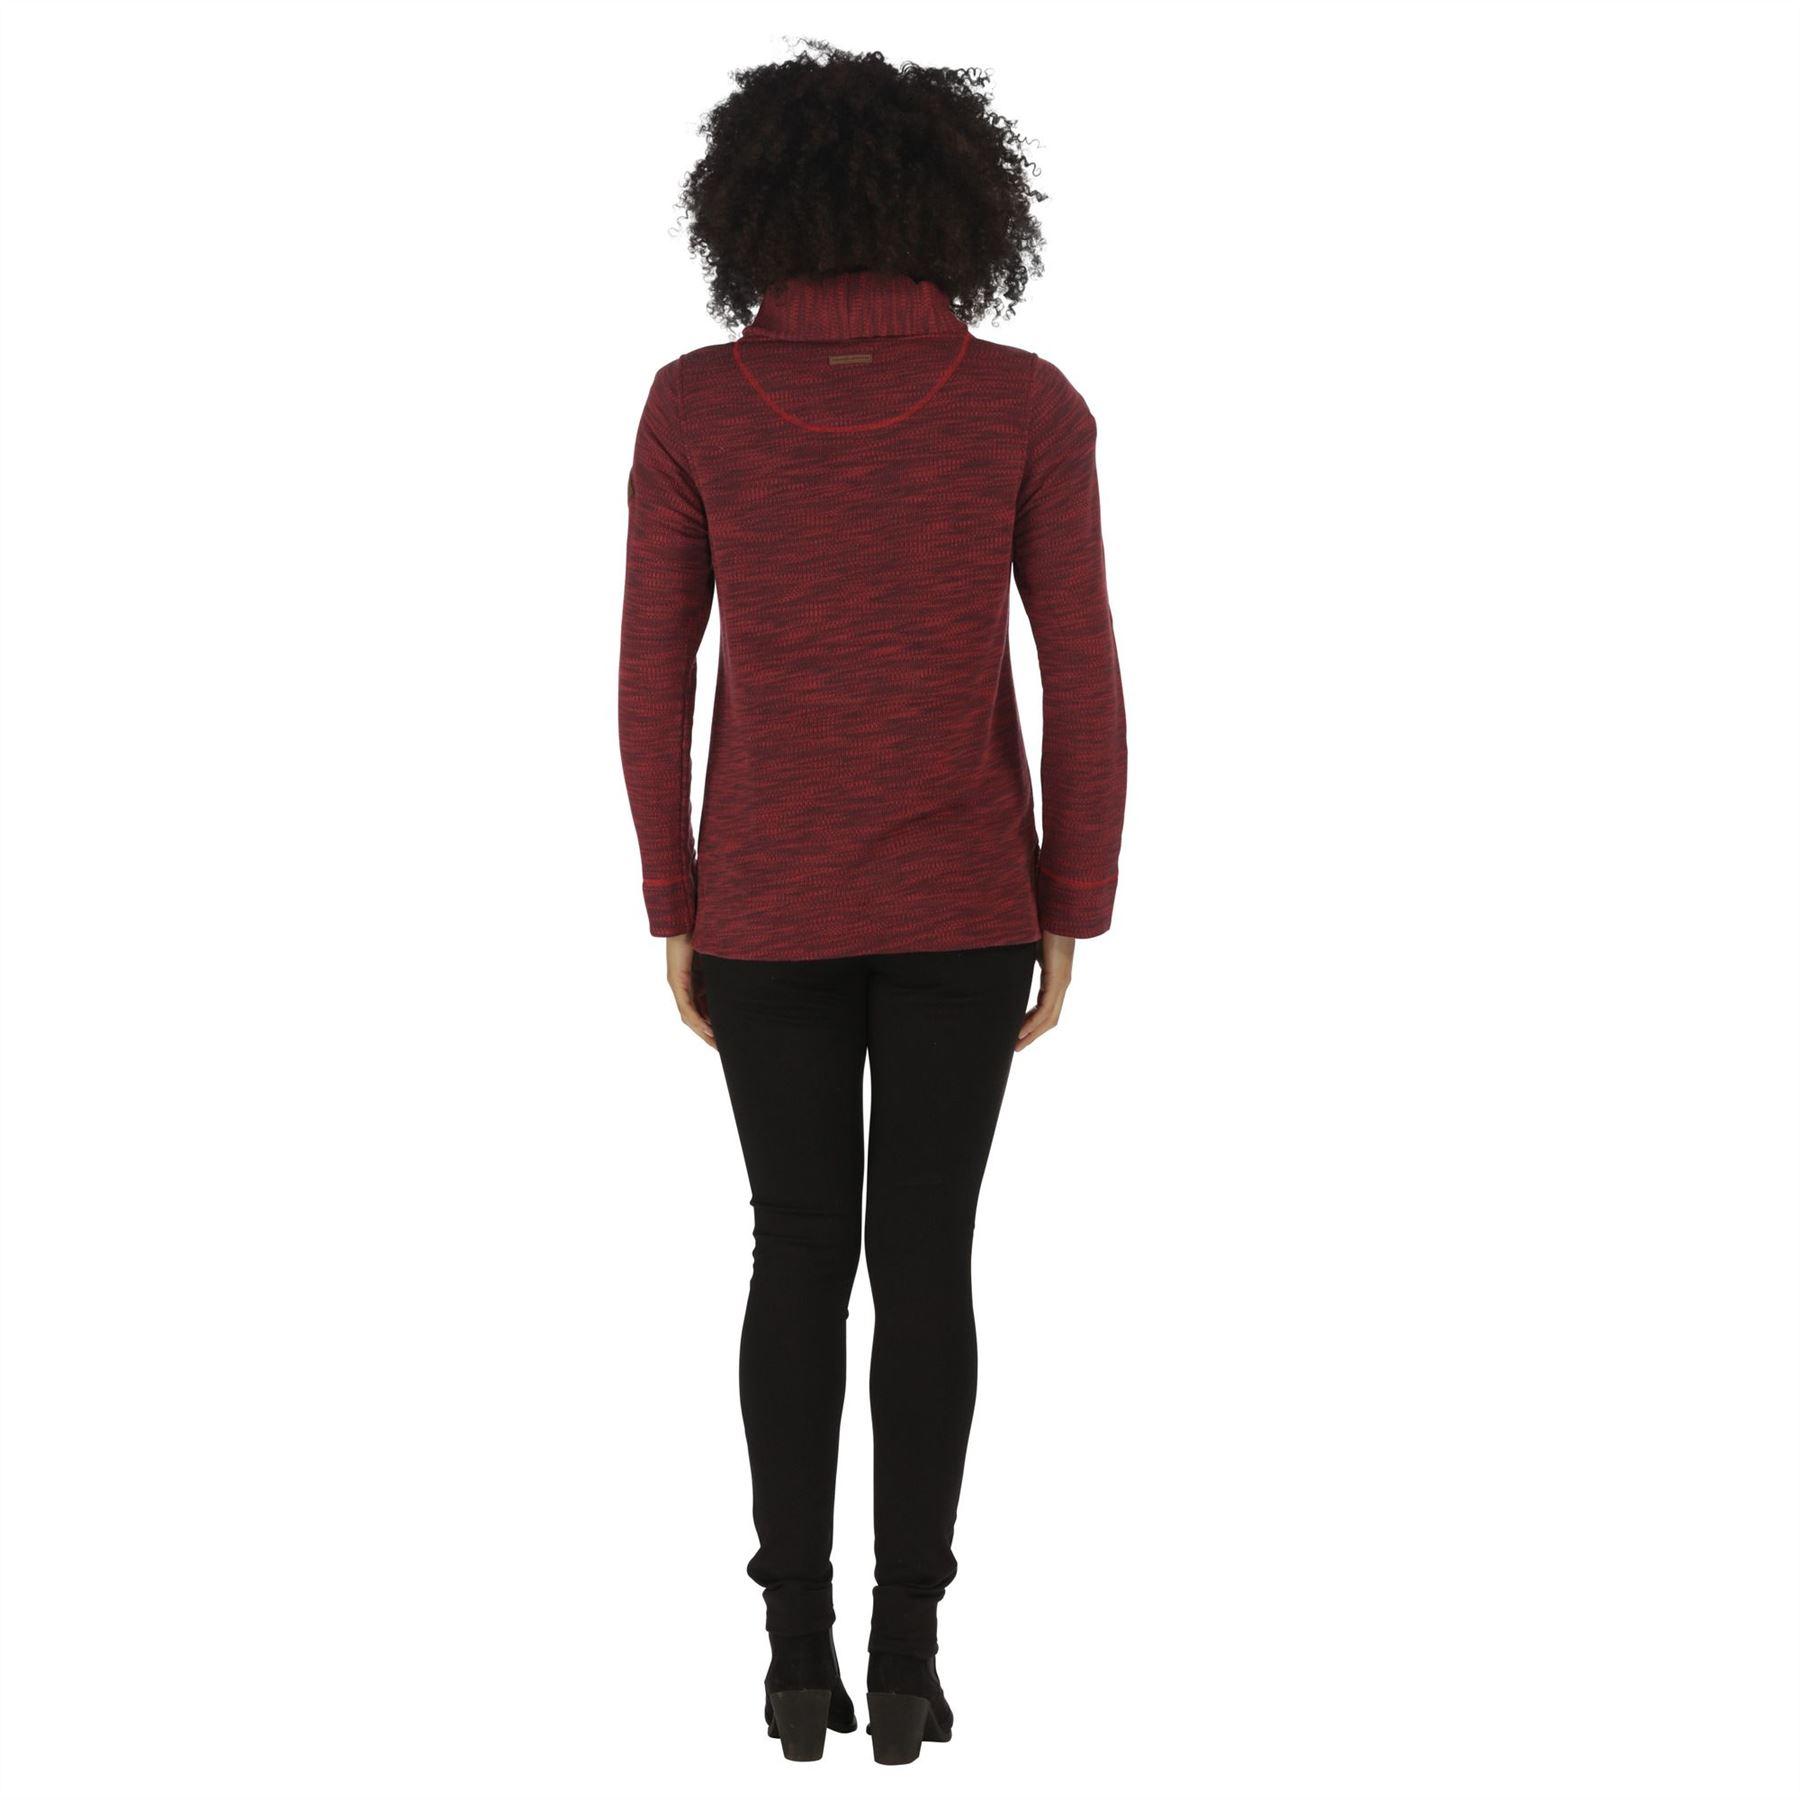 Regatta-Ceanna-Cowl-Neck-Soft-Fleece-Pull-Over-Jumper-Sweater-Top-RWA276 thumbnail 9